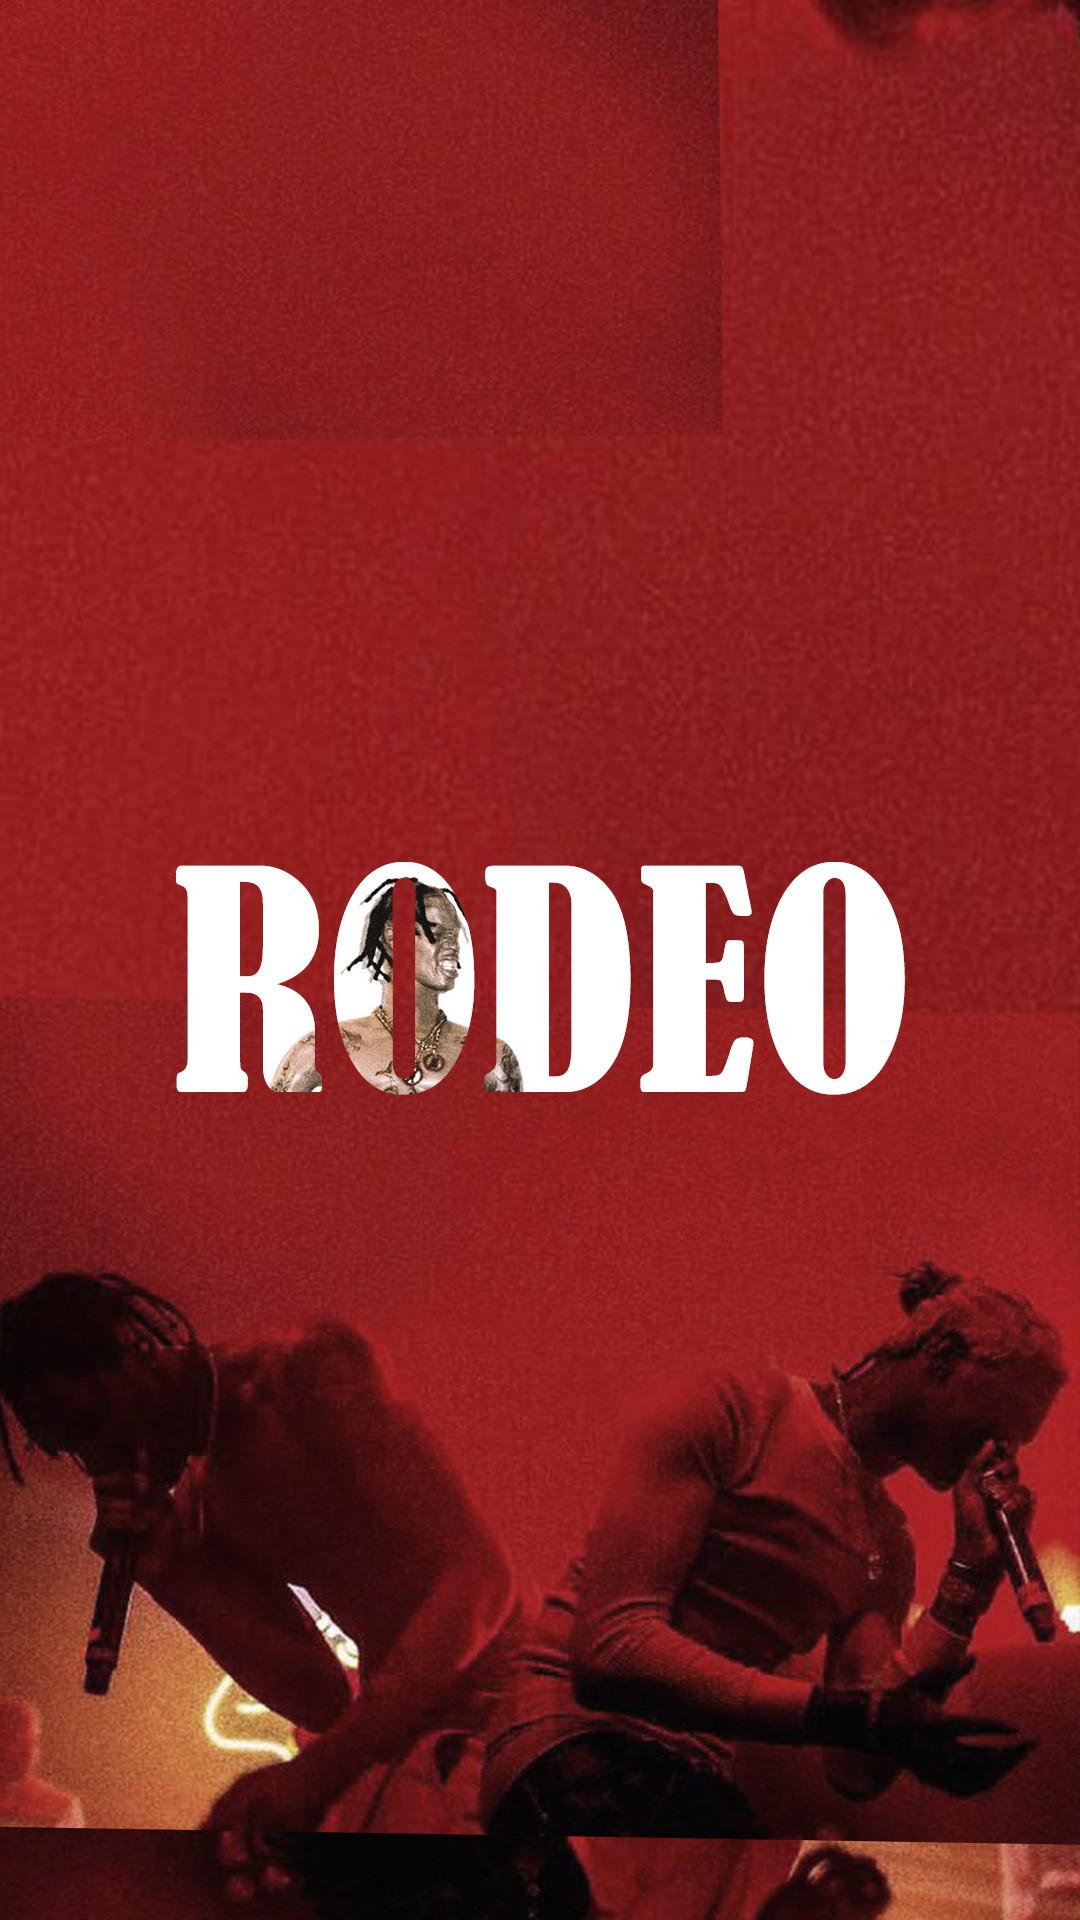 … travis scott desktop background Rodeo …